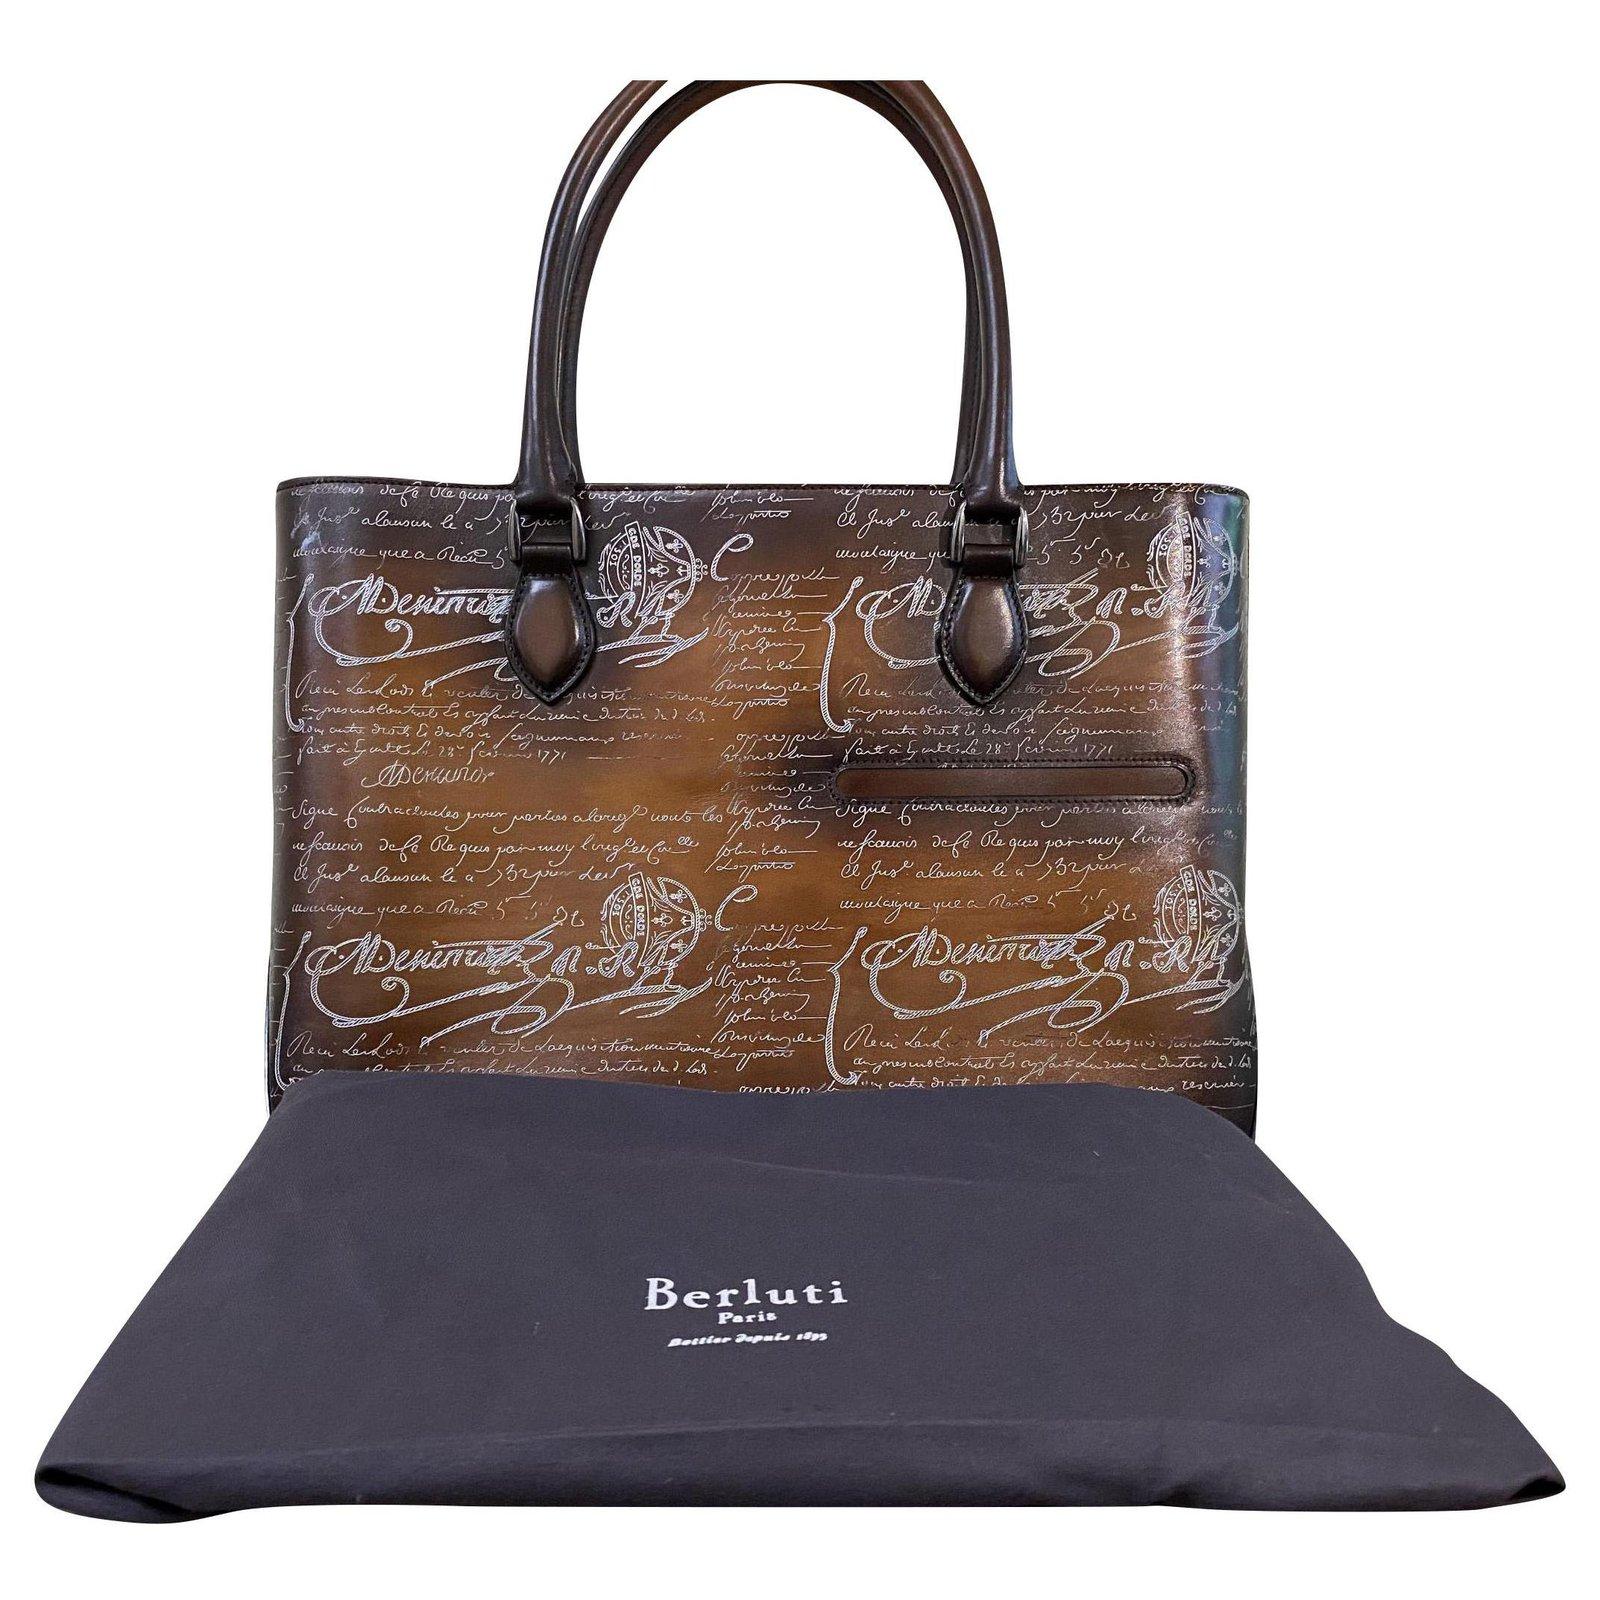 Berluti Berluti TOUJOURS Calf leather Brown Tote Bag Bags Briefcases Leather Brown ref.175977 - Joli Closet